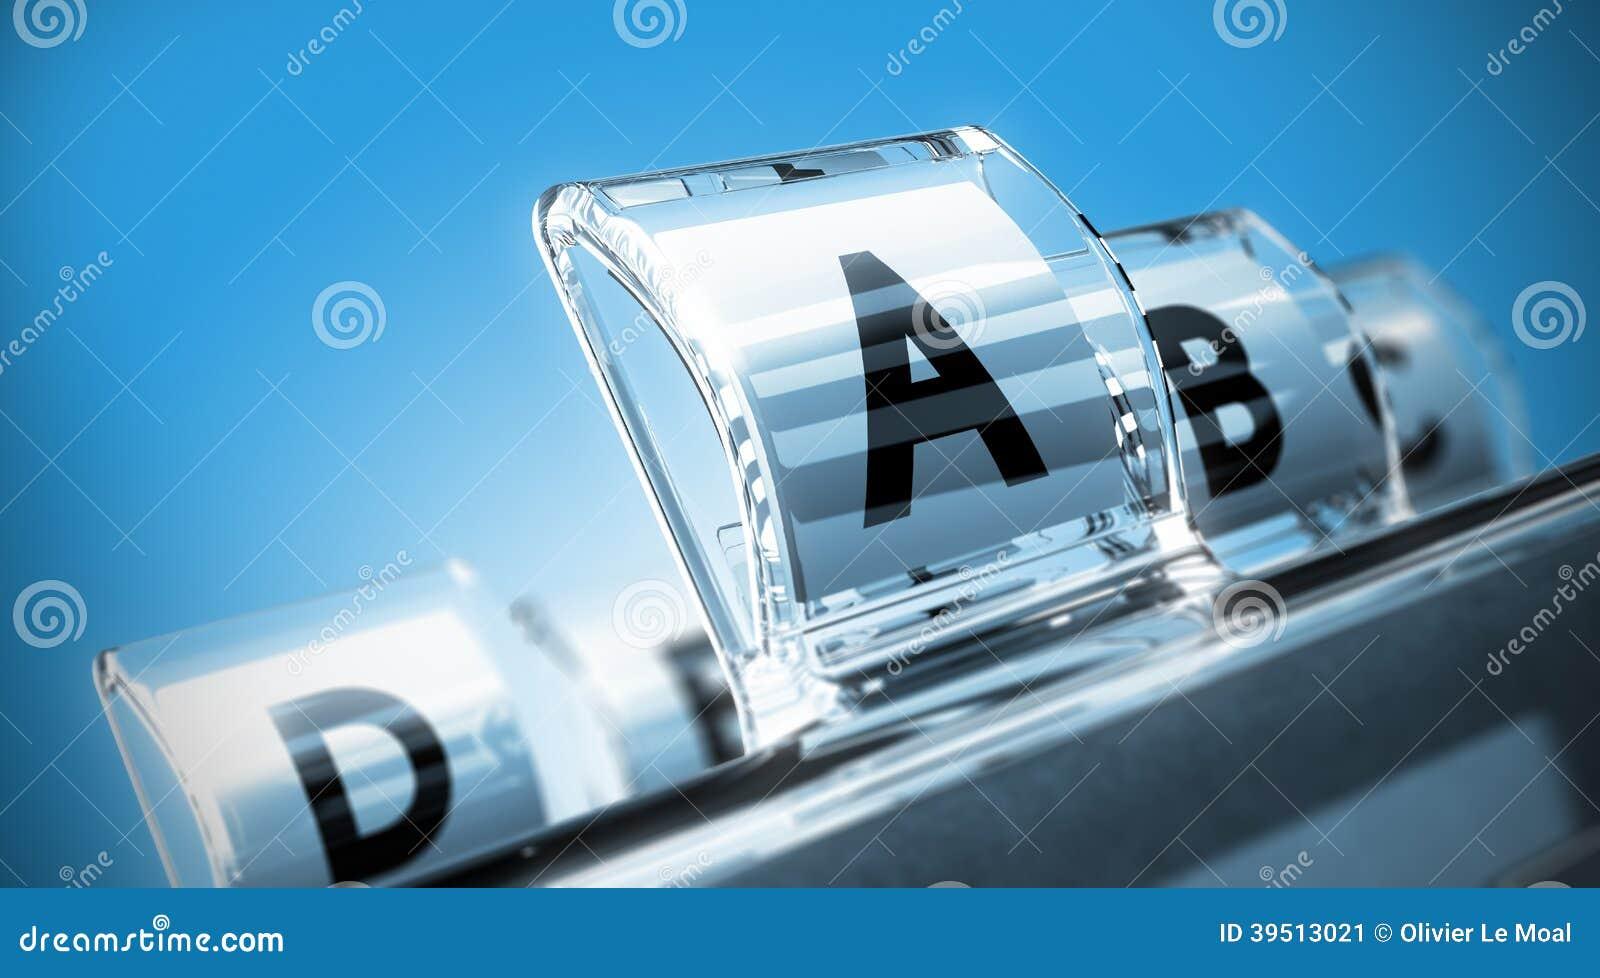 Alphabetical Directory